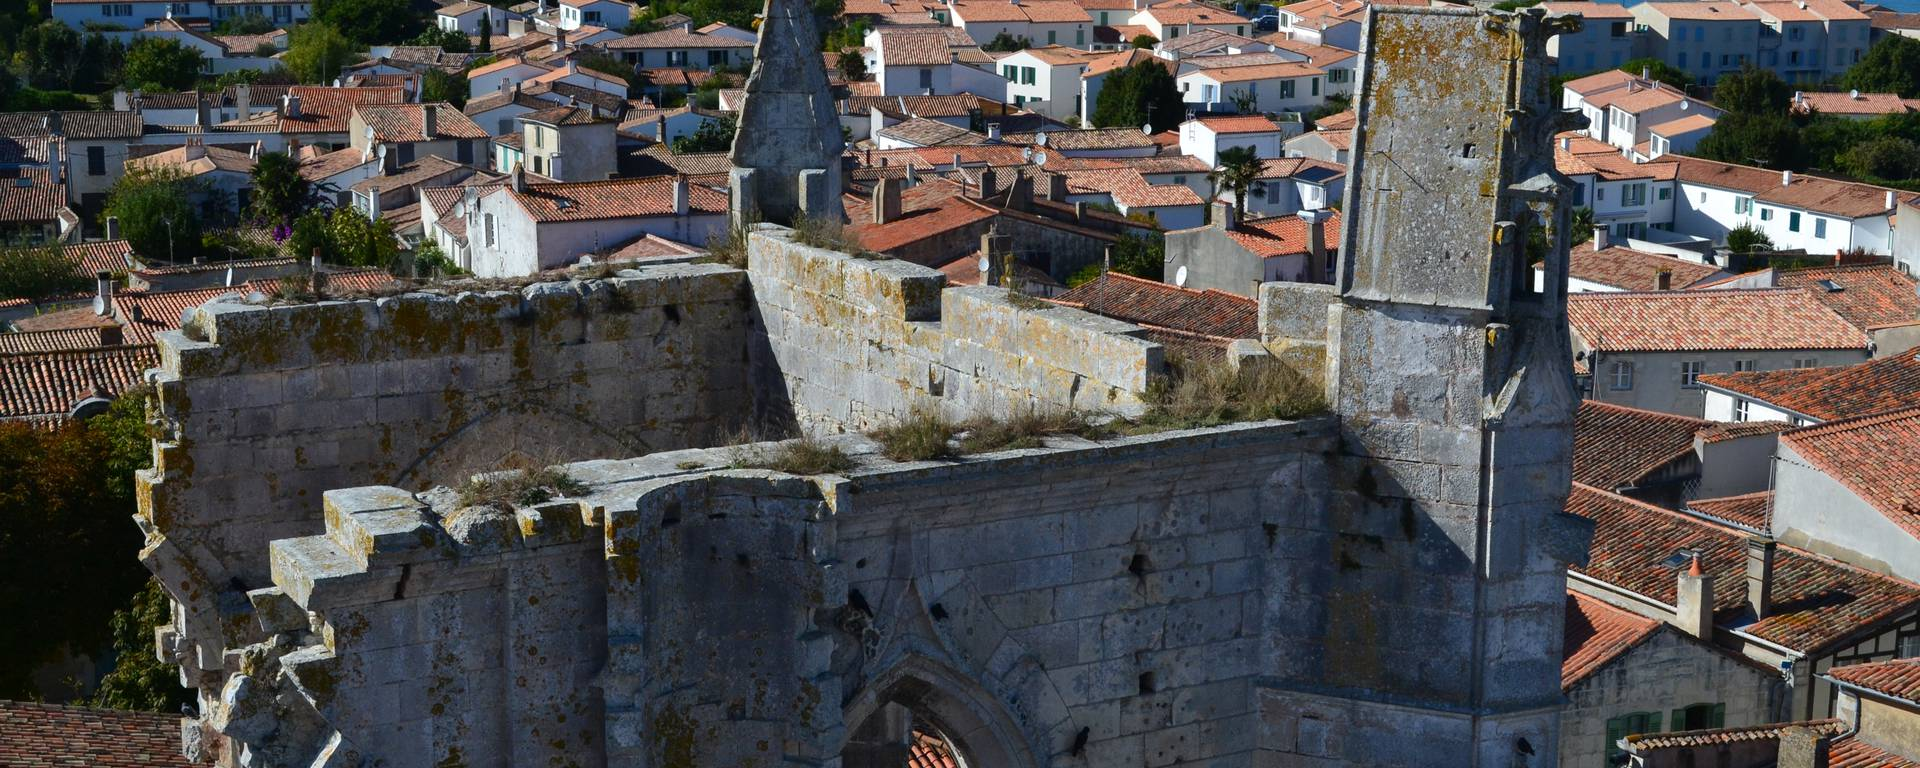 vue du clocher de st martin©maeva_villeneuve